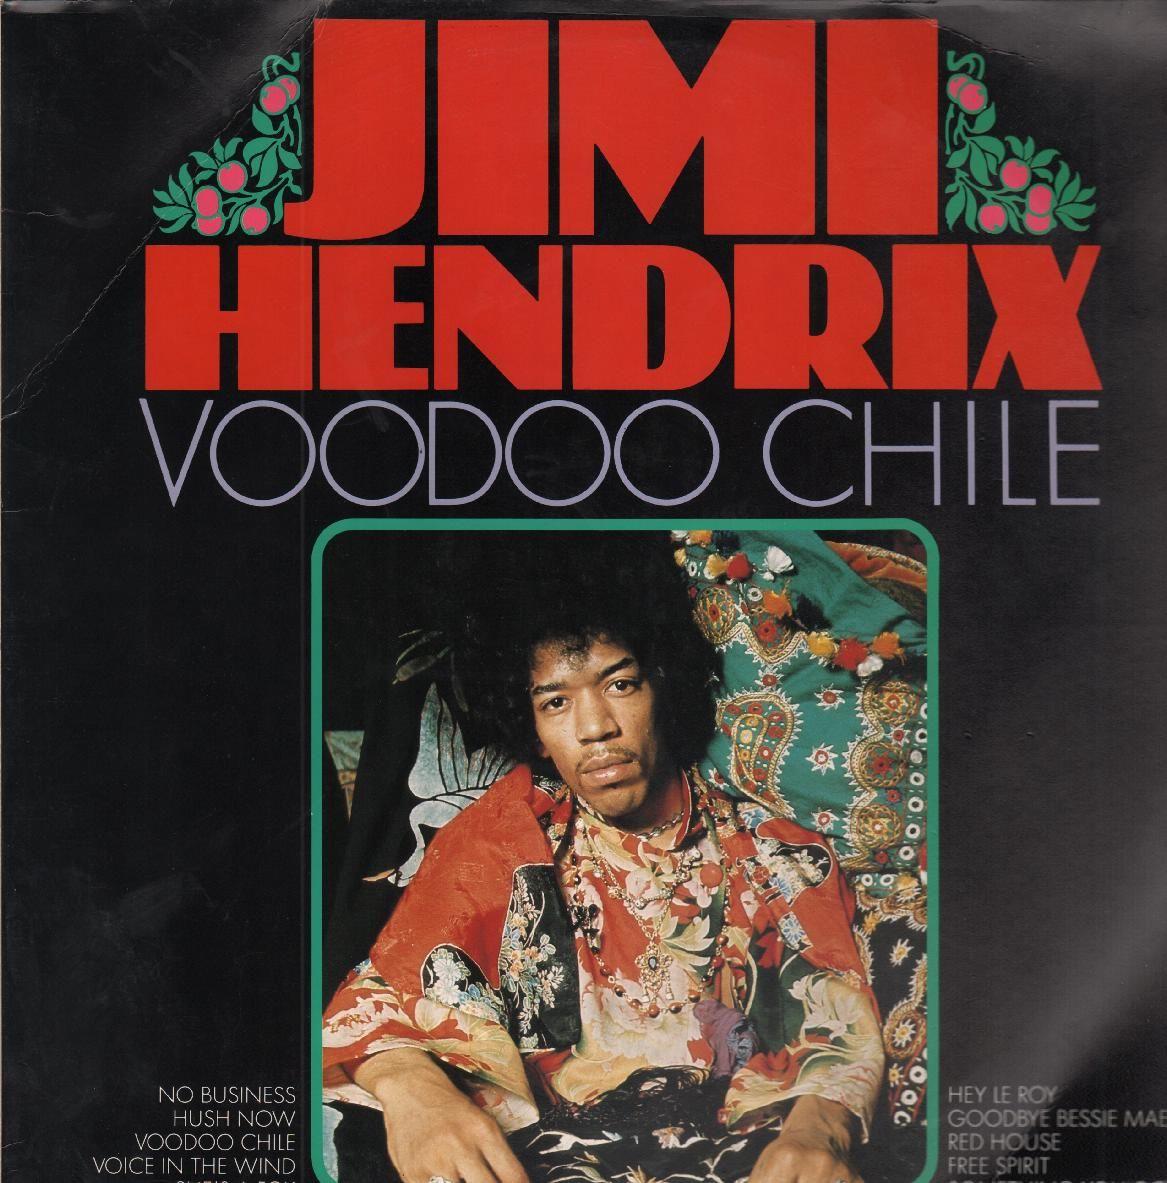 jimihendrix-voodoochile4.jpg?w=1167